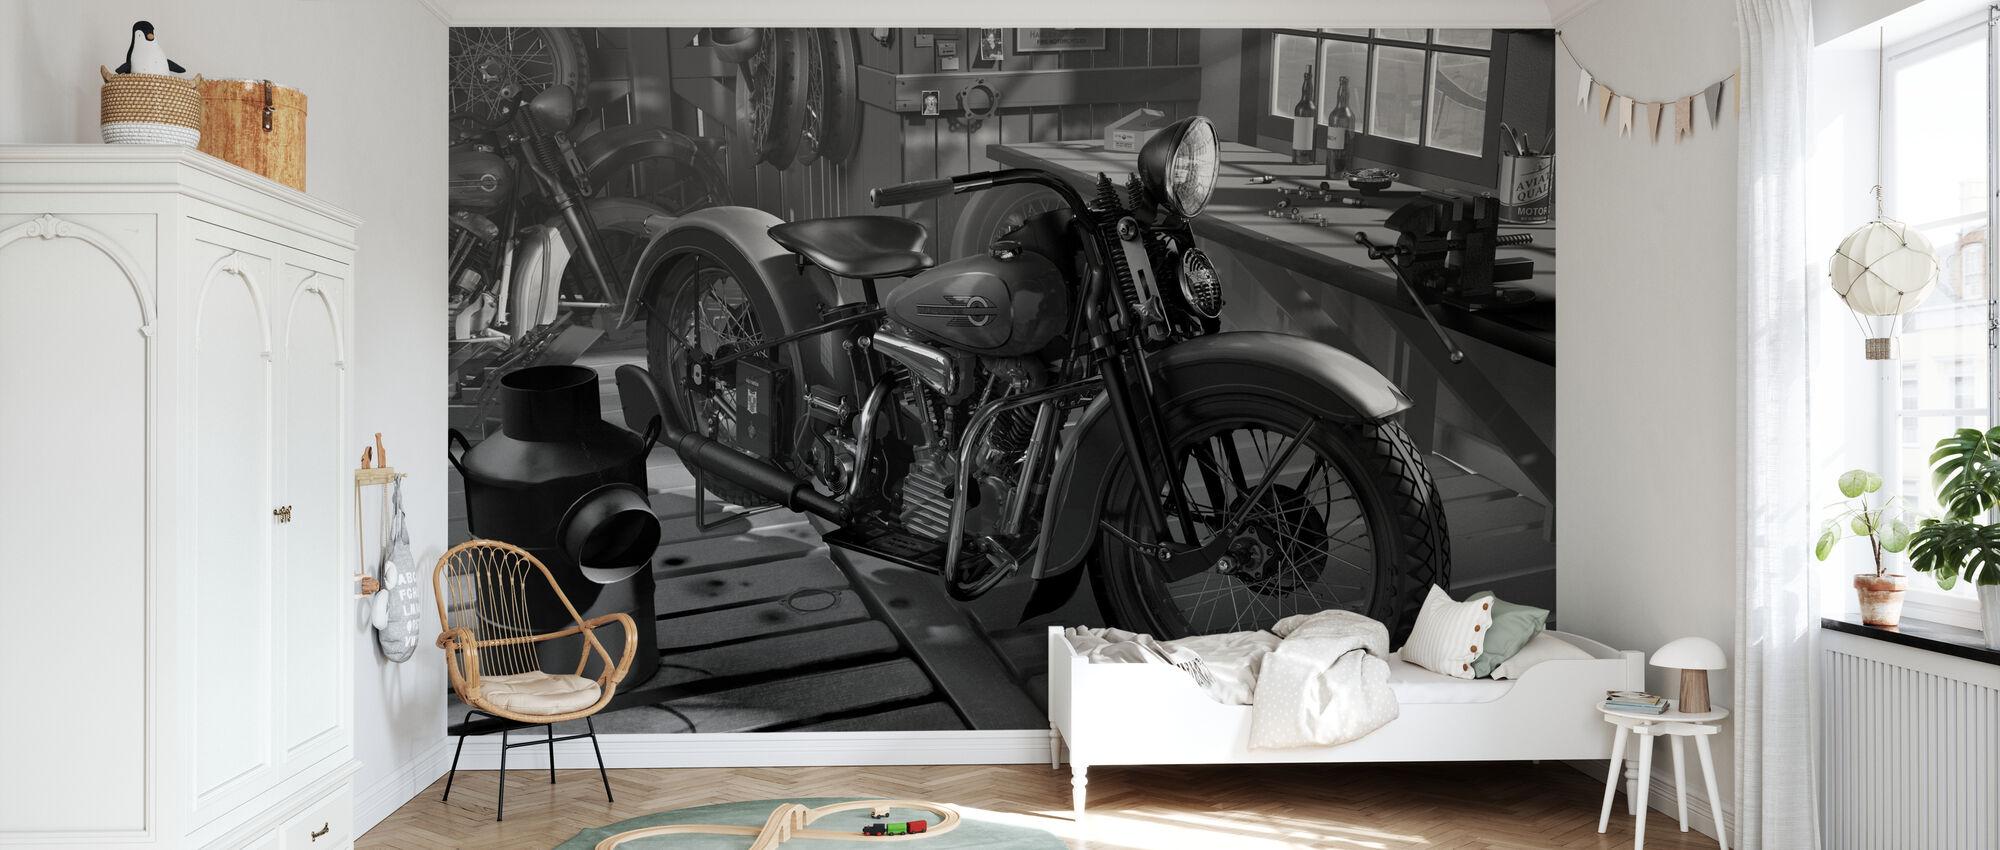 Old Barn BW - Wallpaper - Kids Room